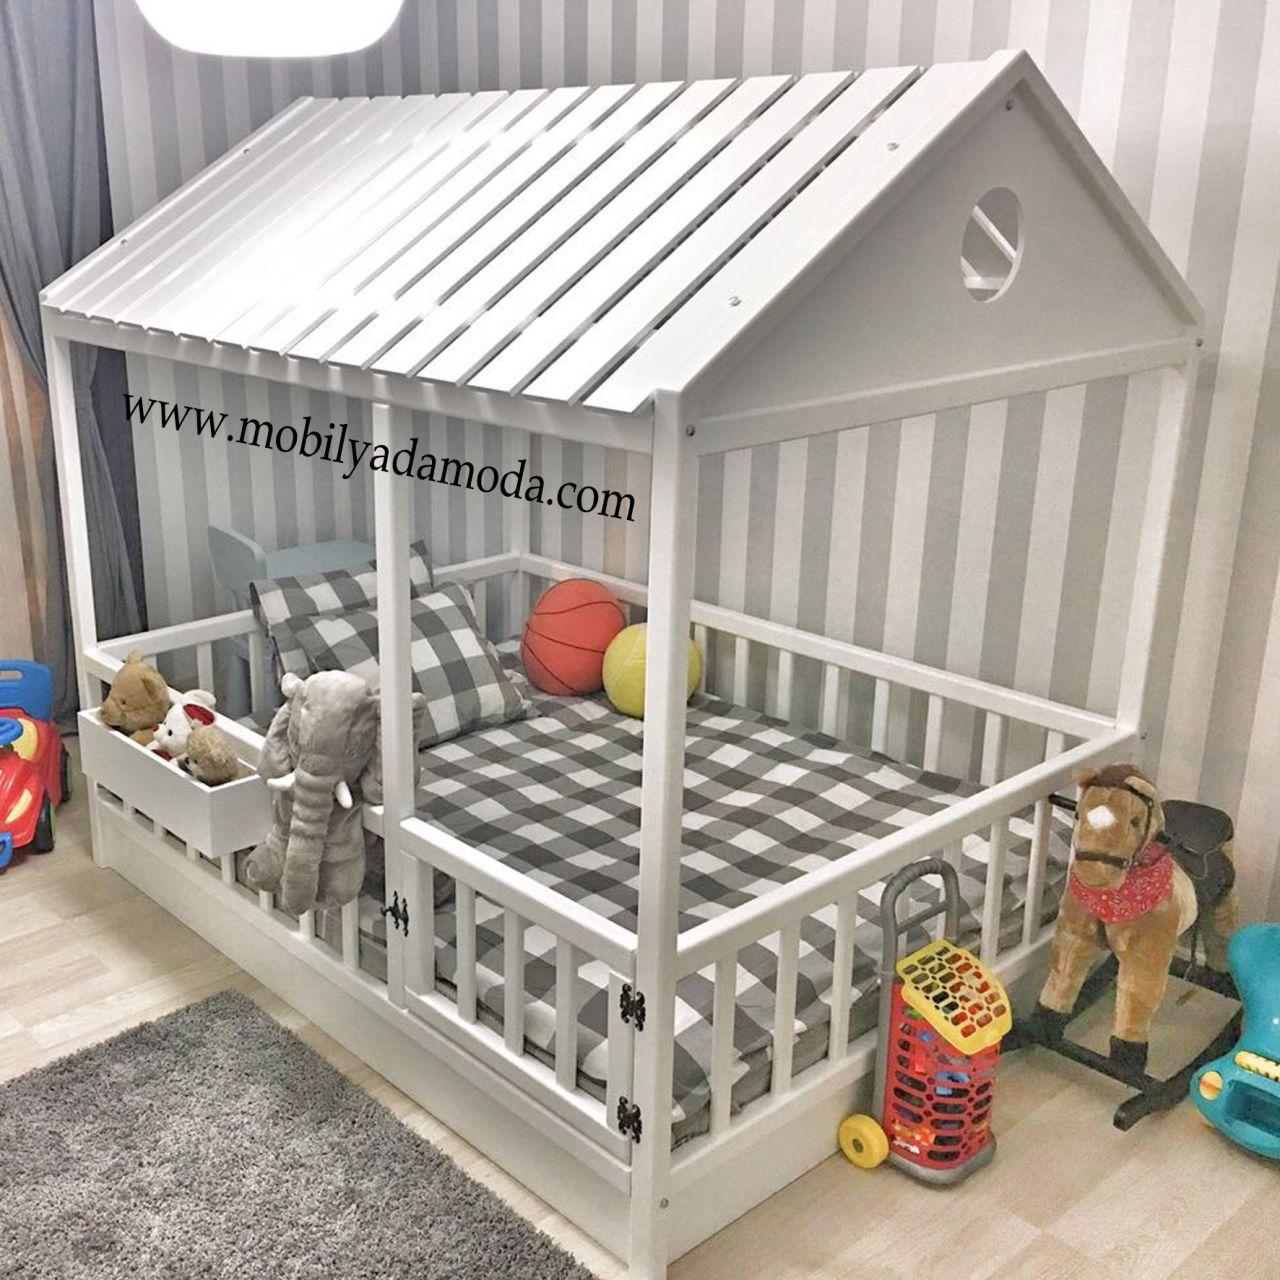 Bebek Cocuk Genc Odalari Montessori Odalari Bebek Yatak Ortuleri Cocuk Oyun Alanlari Bebek Mobilya